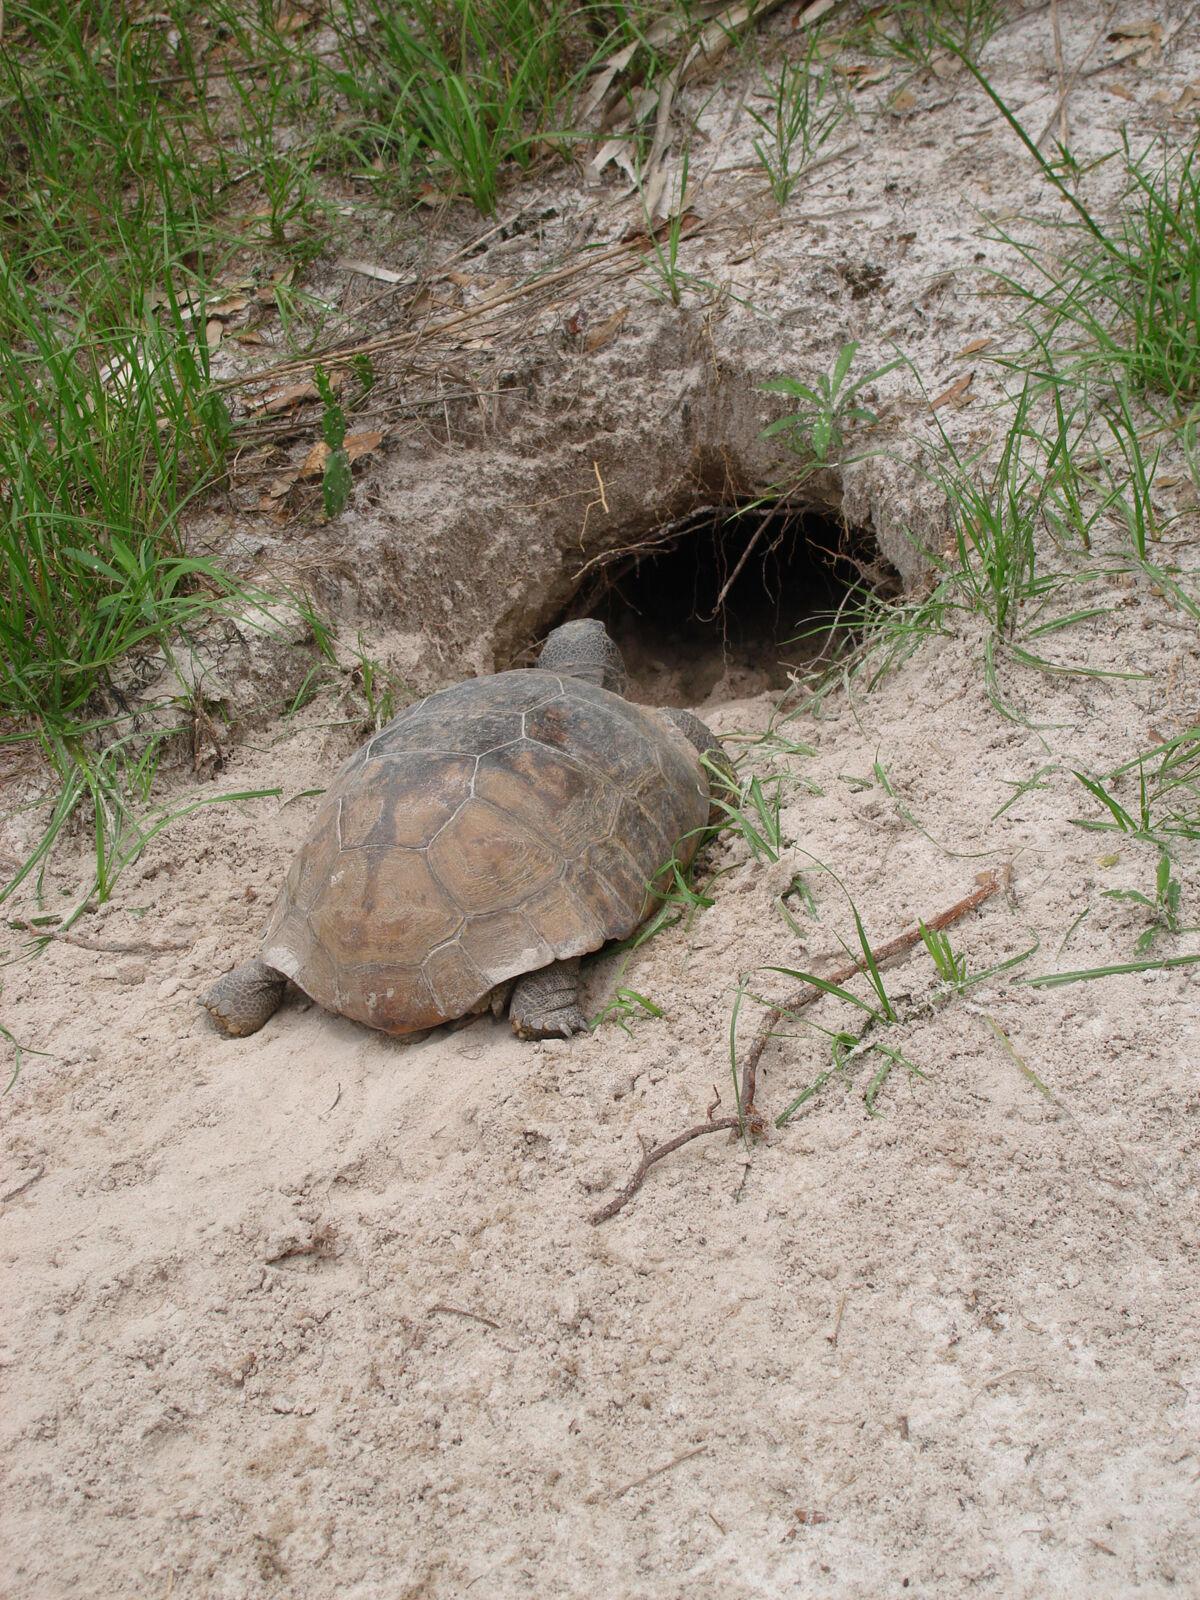 gopher tortoise entering burrow